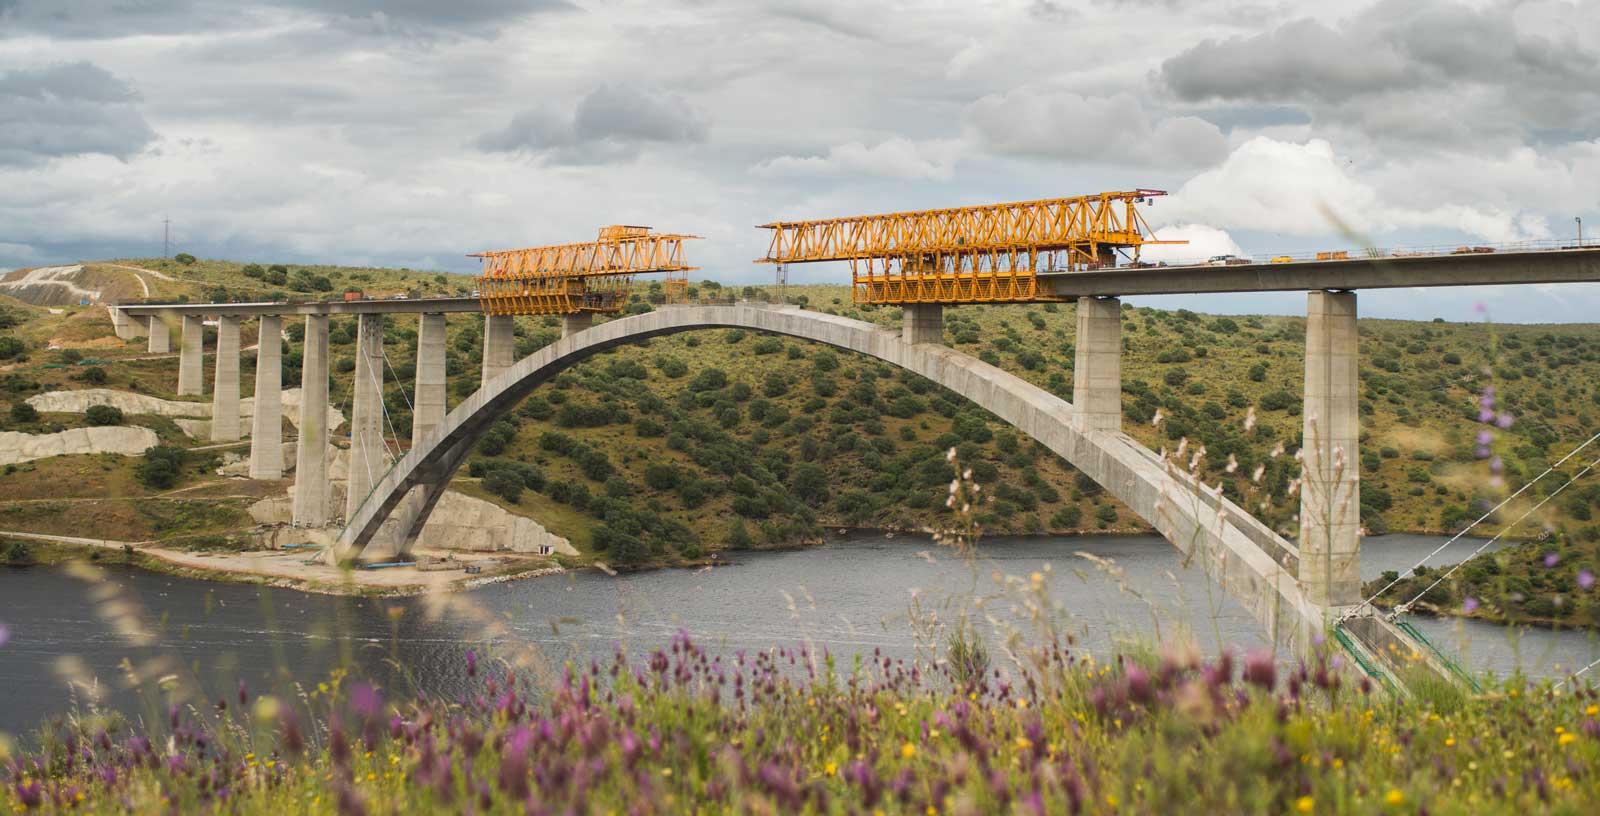 Alta_velocidad_Madrid_Extremadura_transporte_ferrocarril_idom_4_